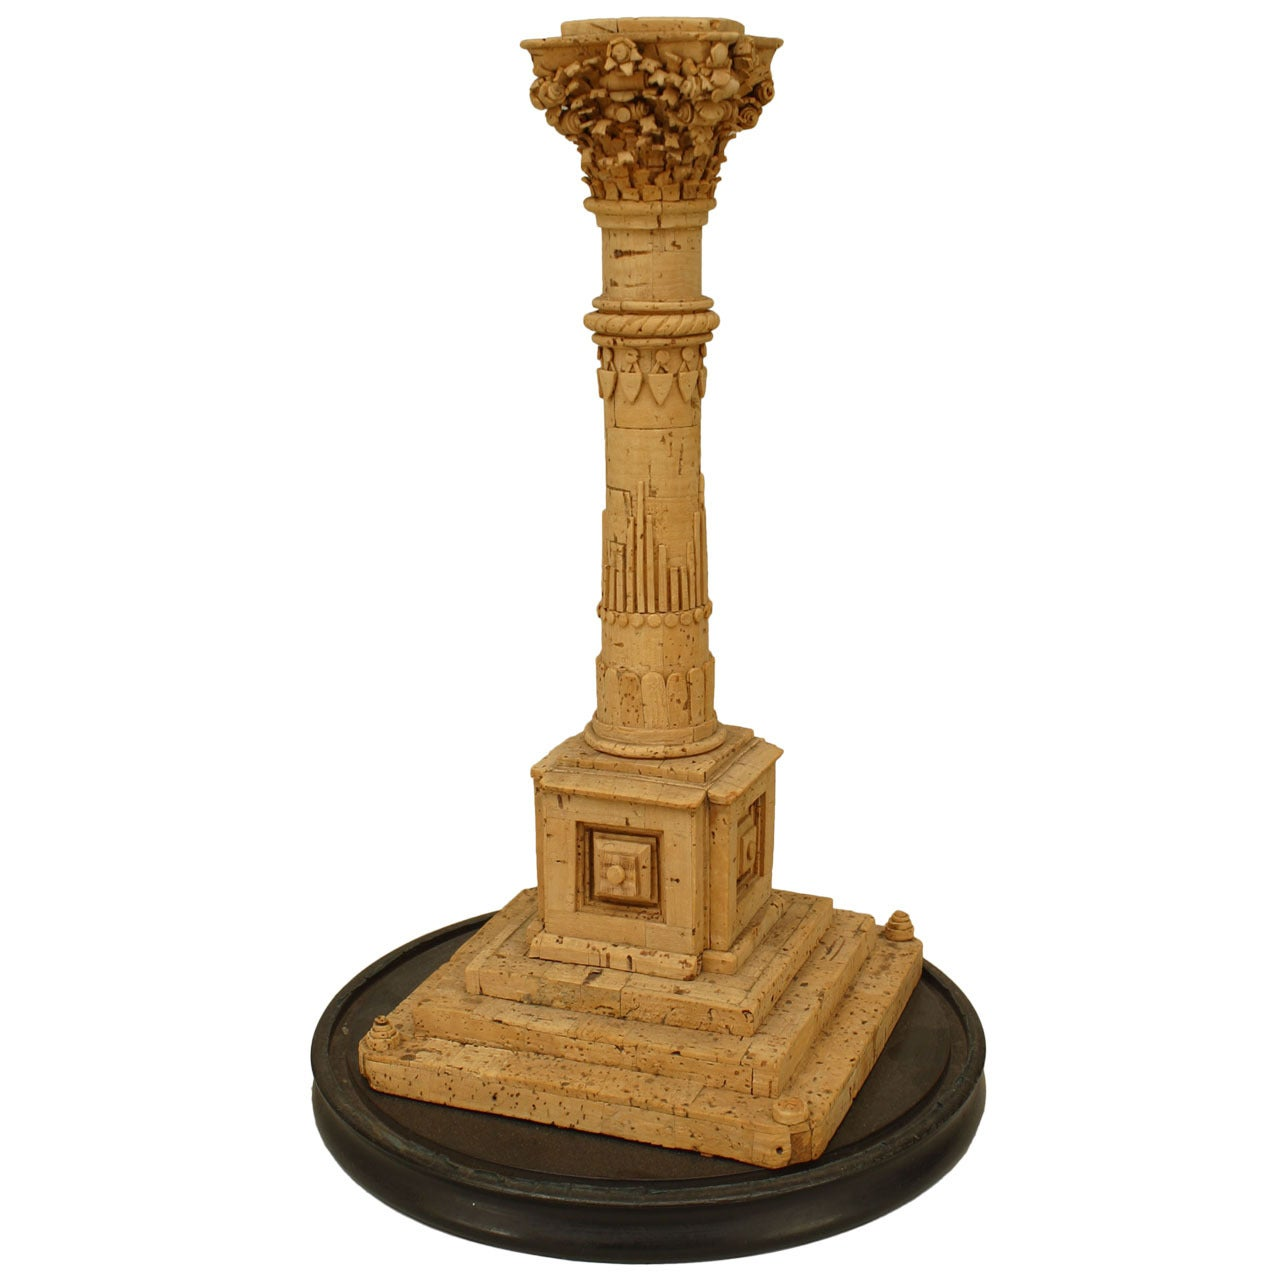 19th Century Italian Neoclassical Carved Cork Column Sculpture